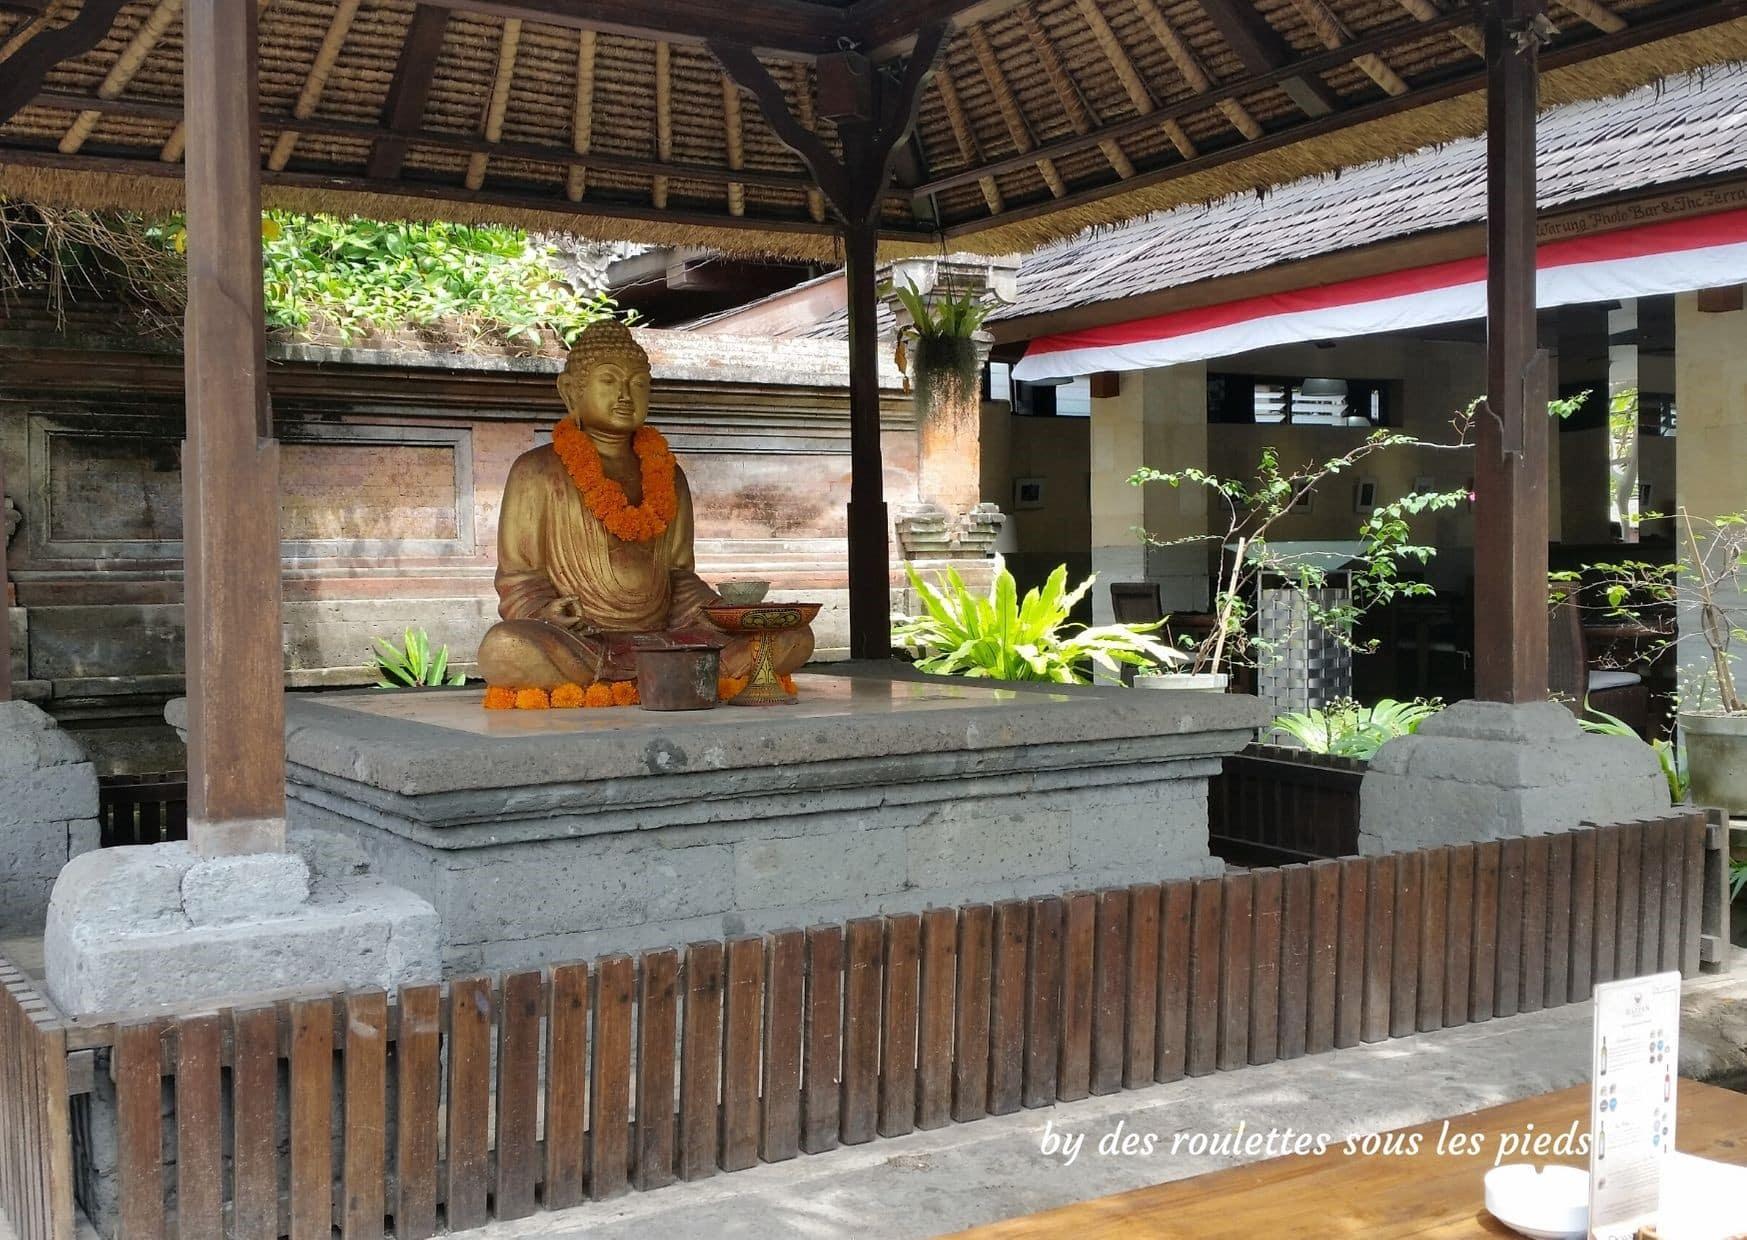 visiter bali ubud et le nord bouddha assis